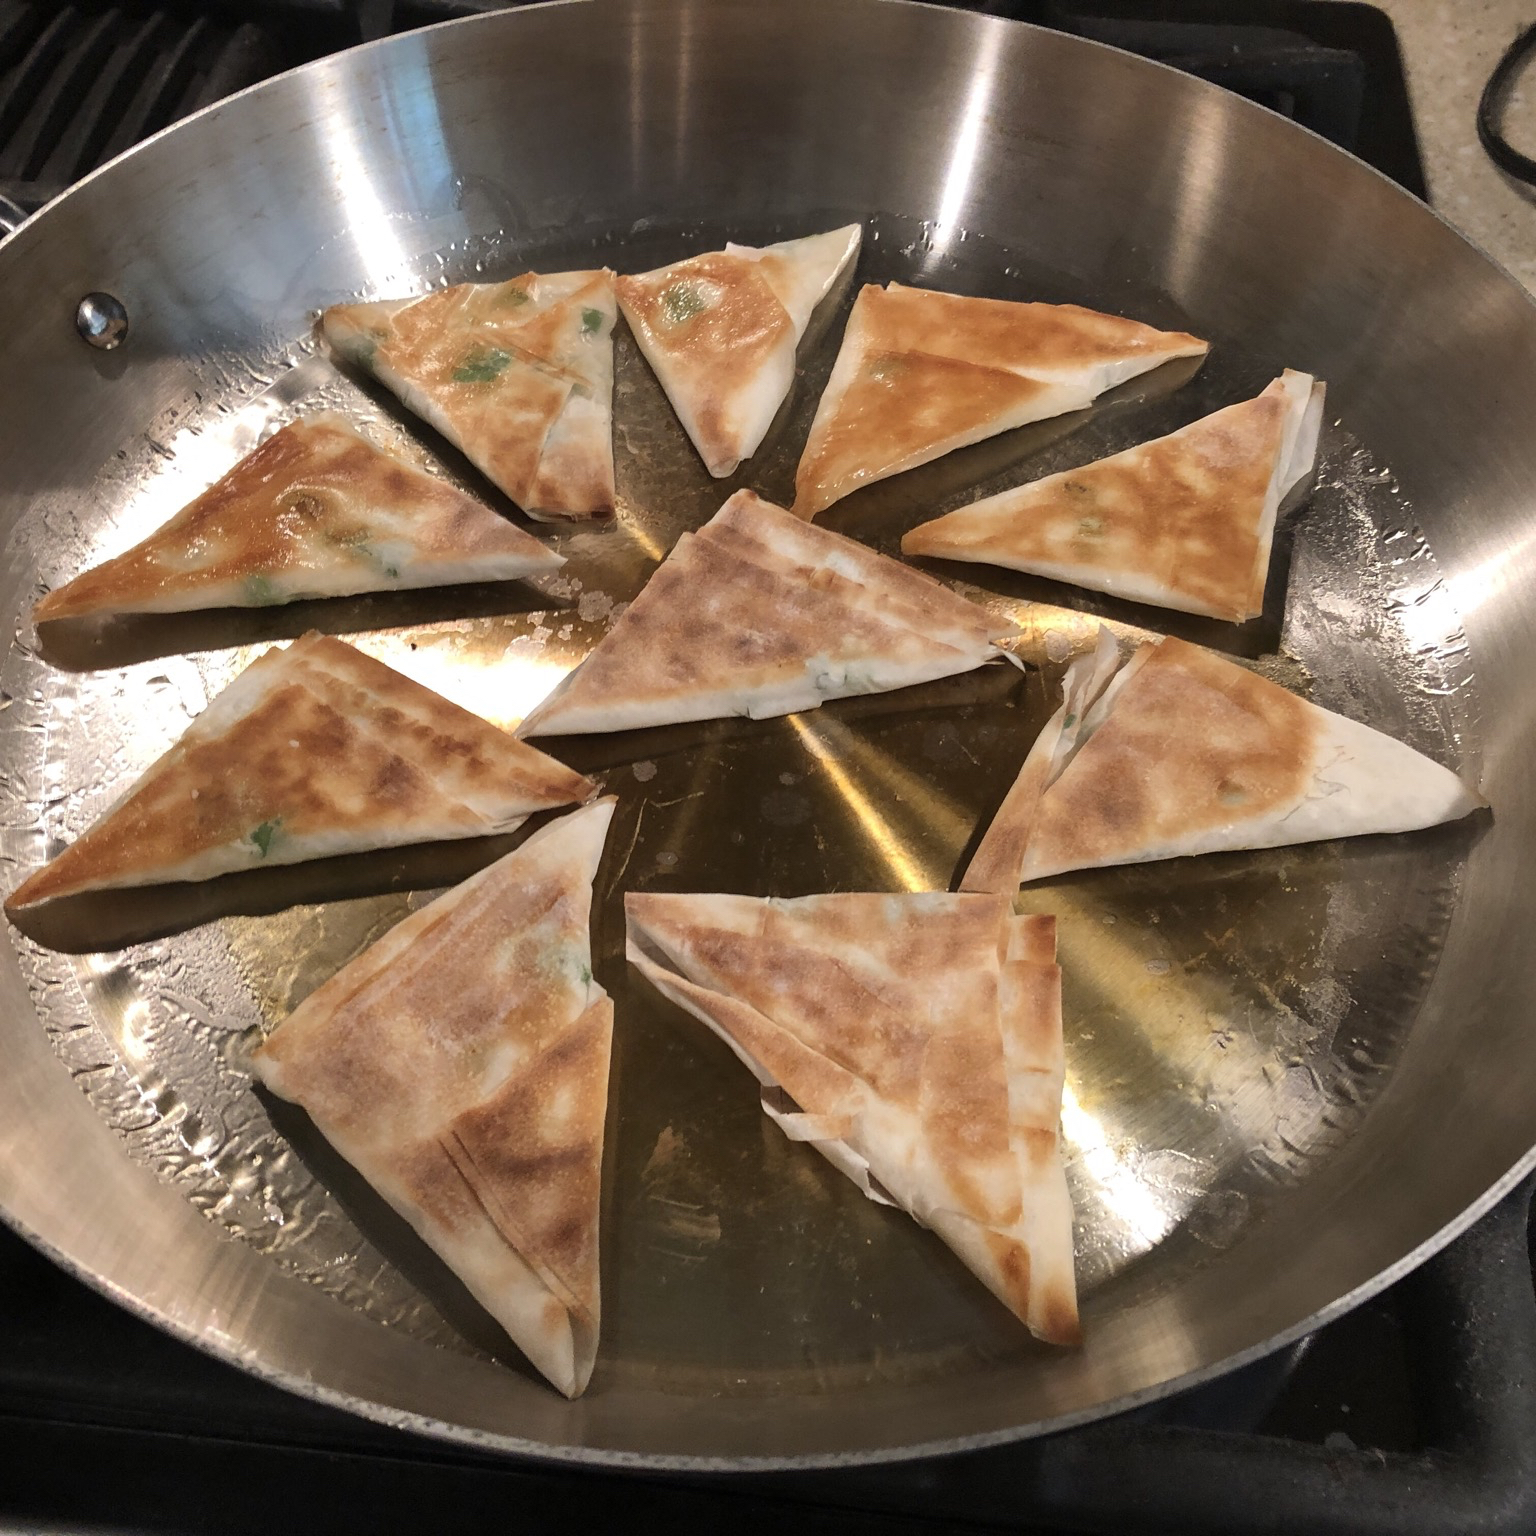 Chinese Scallion Pancakes tnnisace